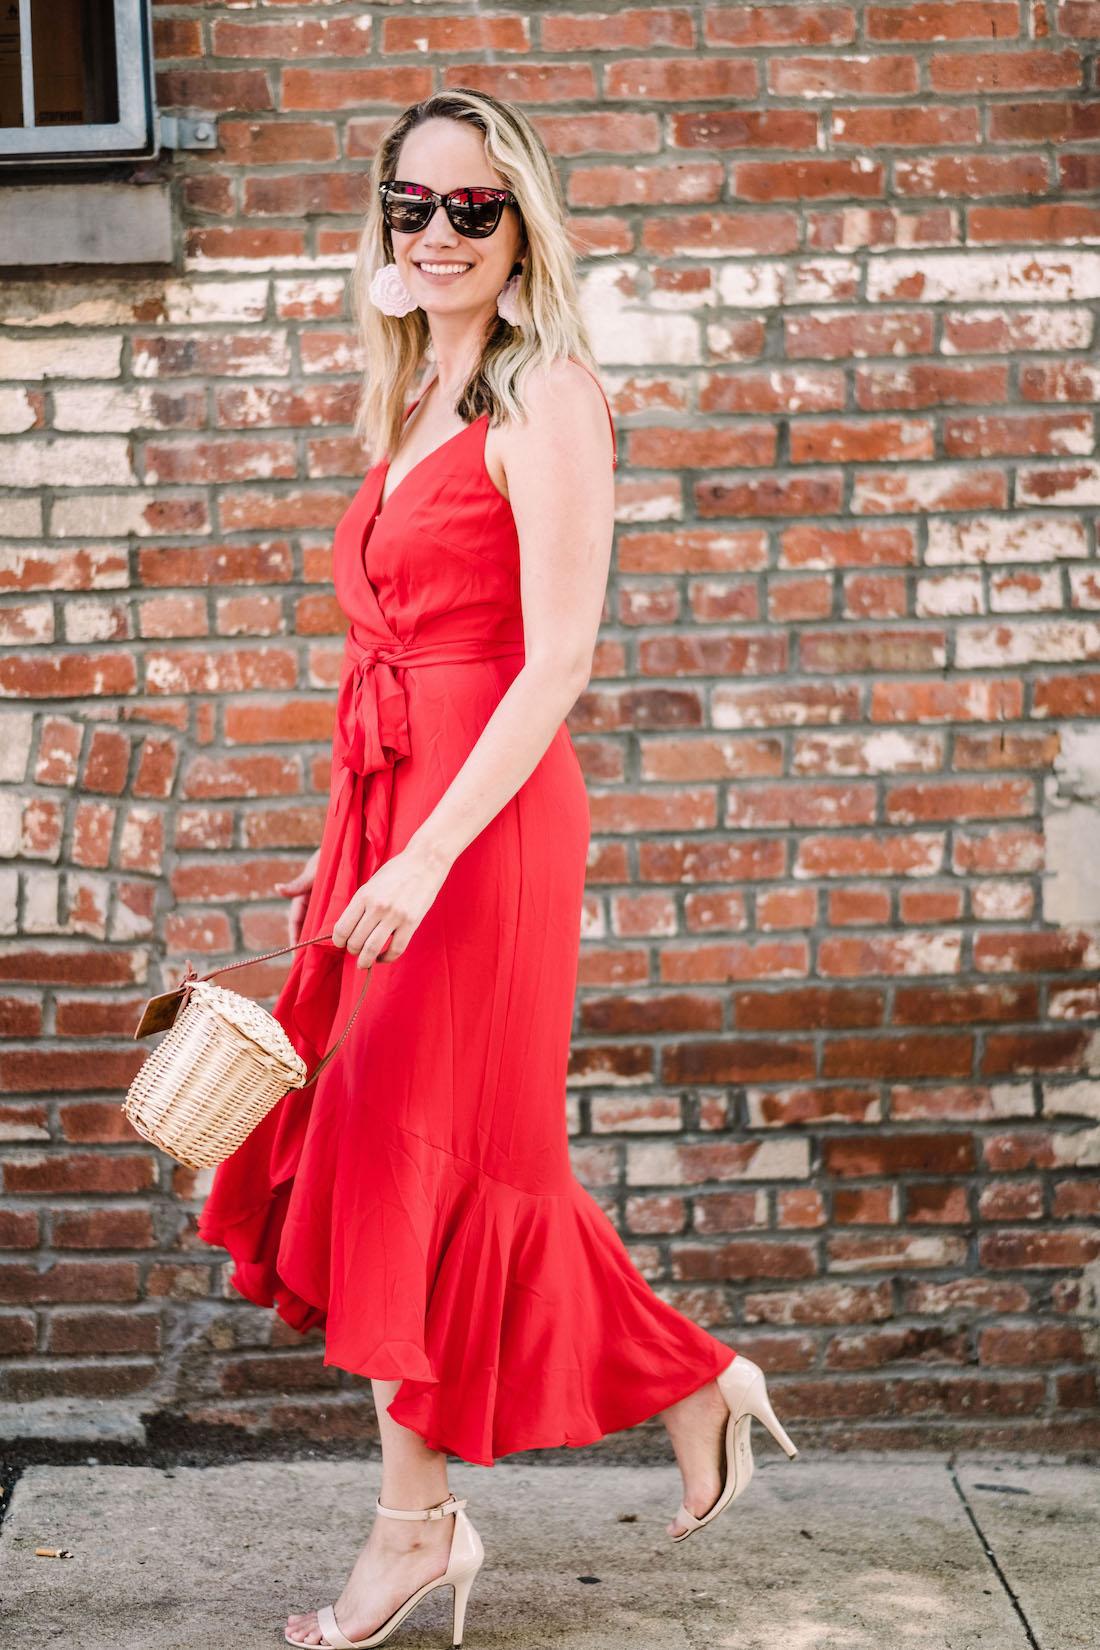 J.Crew Red Dress // BaubleBar Earrings // Steve Madden Sandals // Polaroid Sunglasses // Lindroth Design Mini Birkin - The Stripe